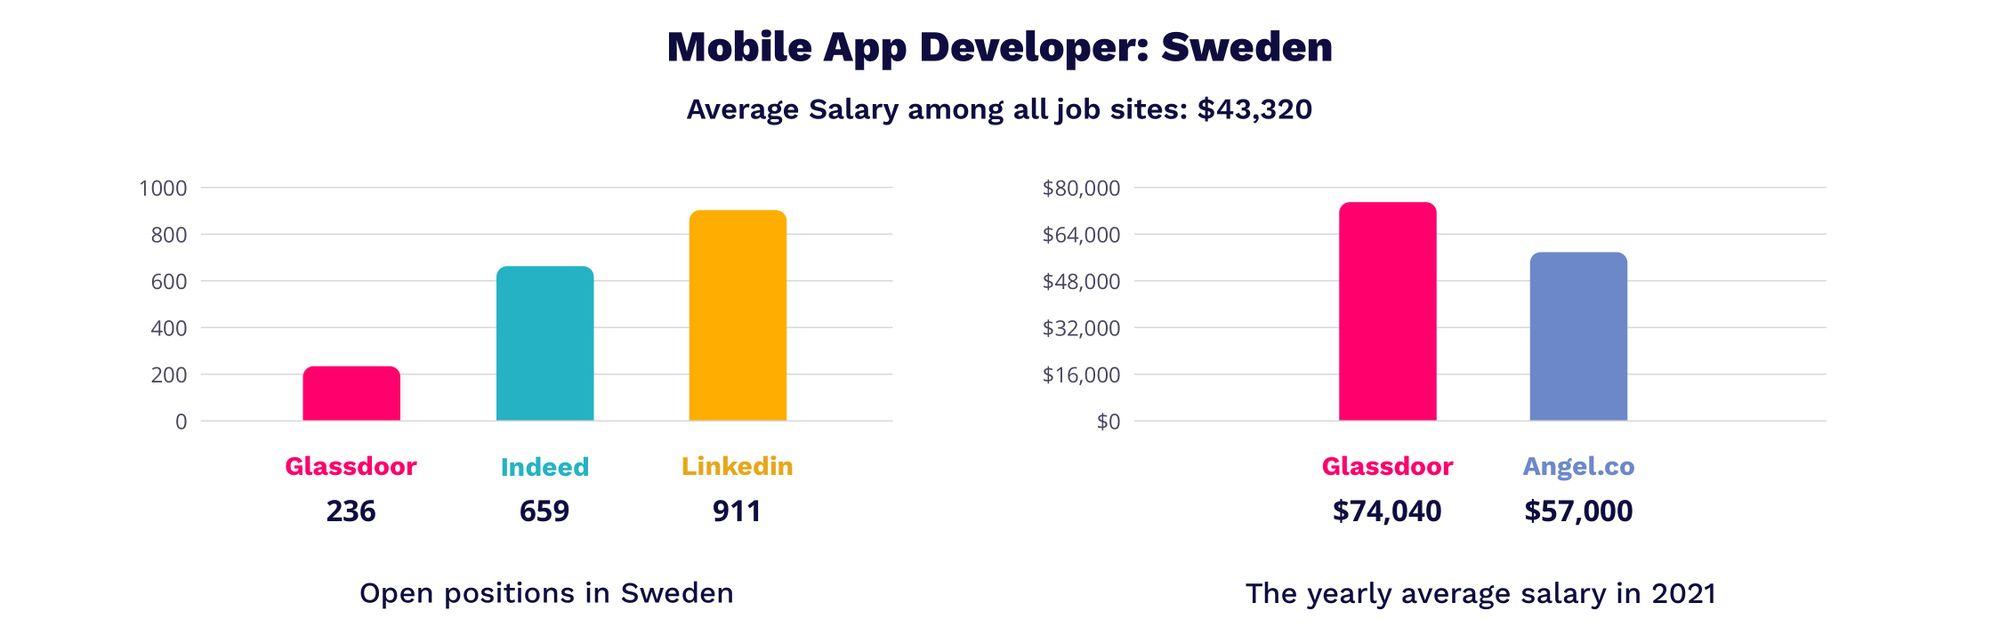 mobile app developer salaries in Sweden